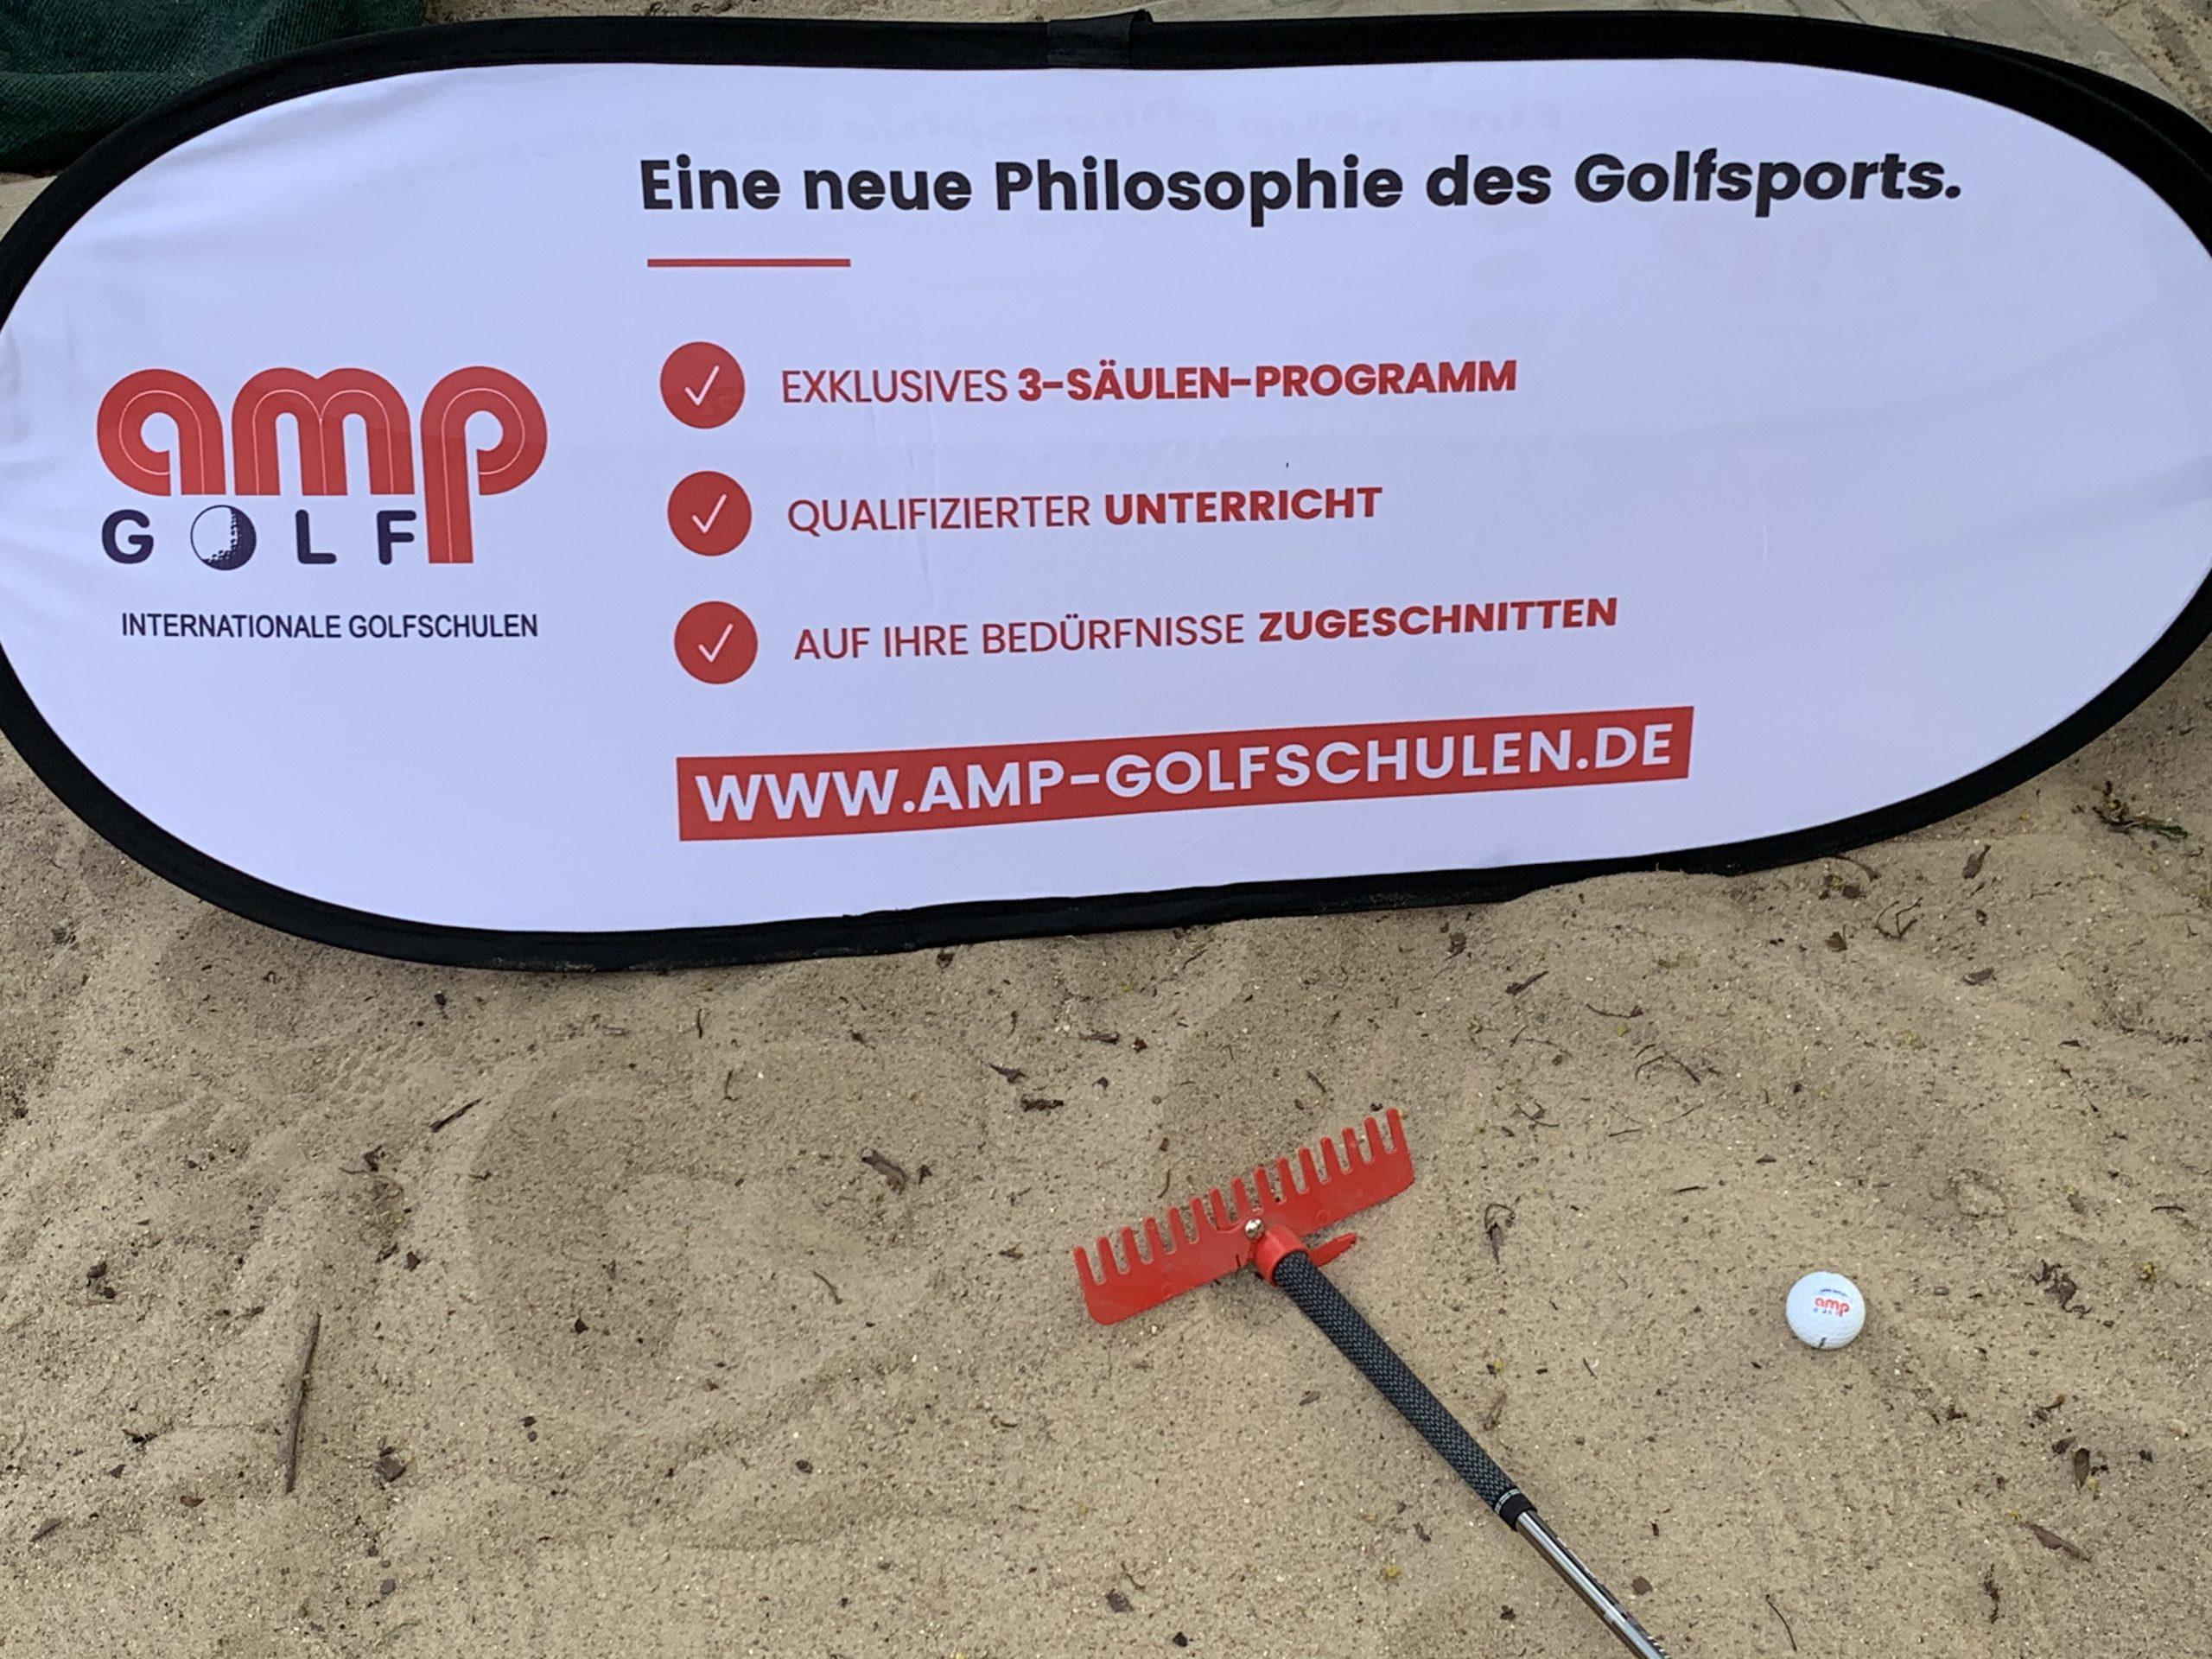 amp Golfschulen - Golfurlaub an den schönsten Orten